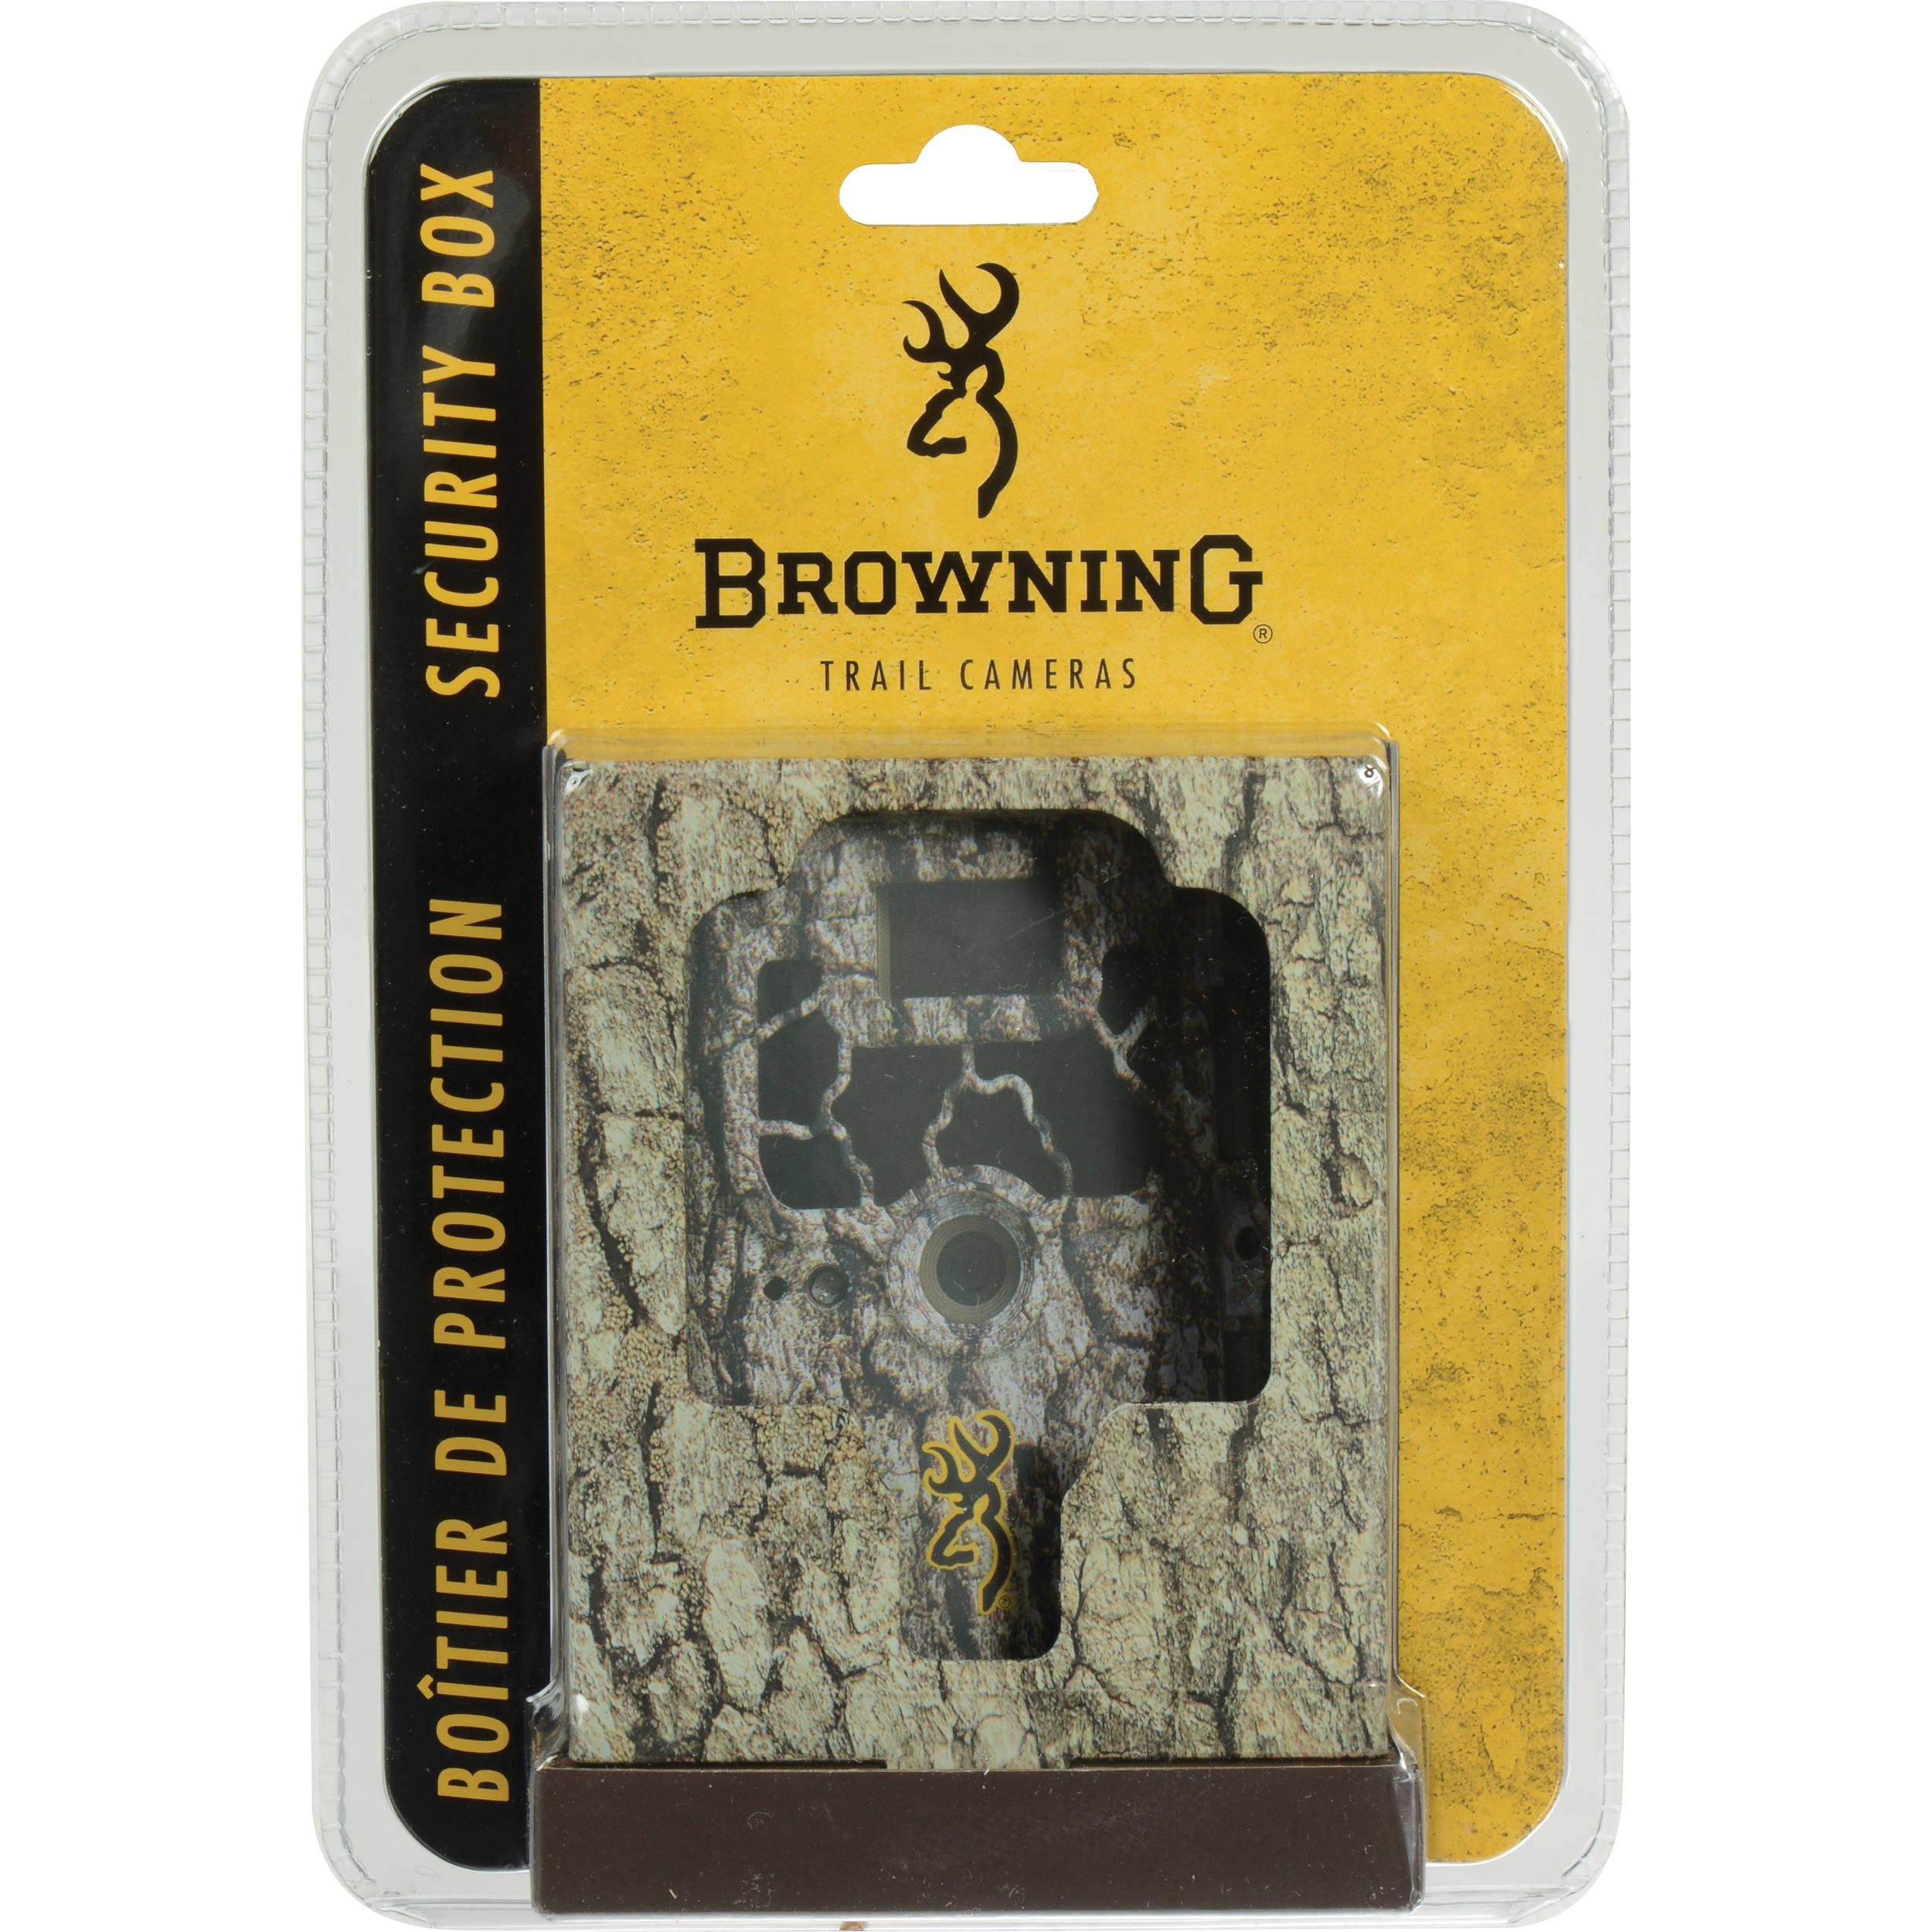 Browning Trail Camera Security Box (Camo) BTC SB B&H Photo Video